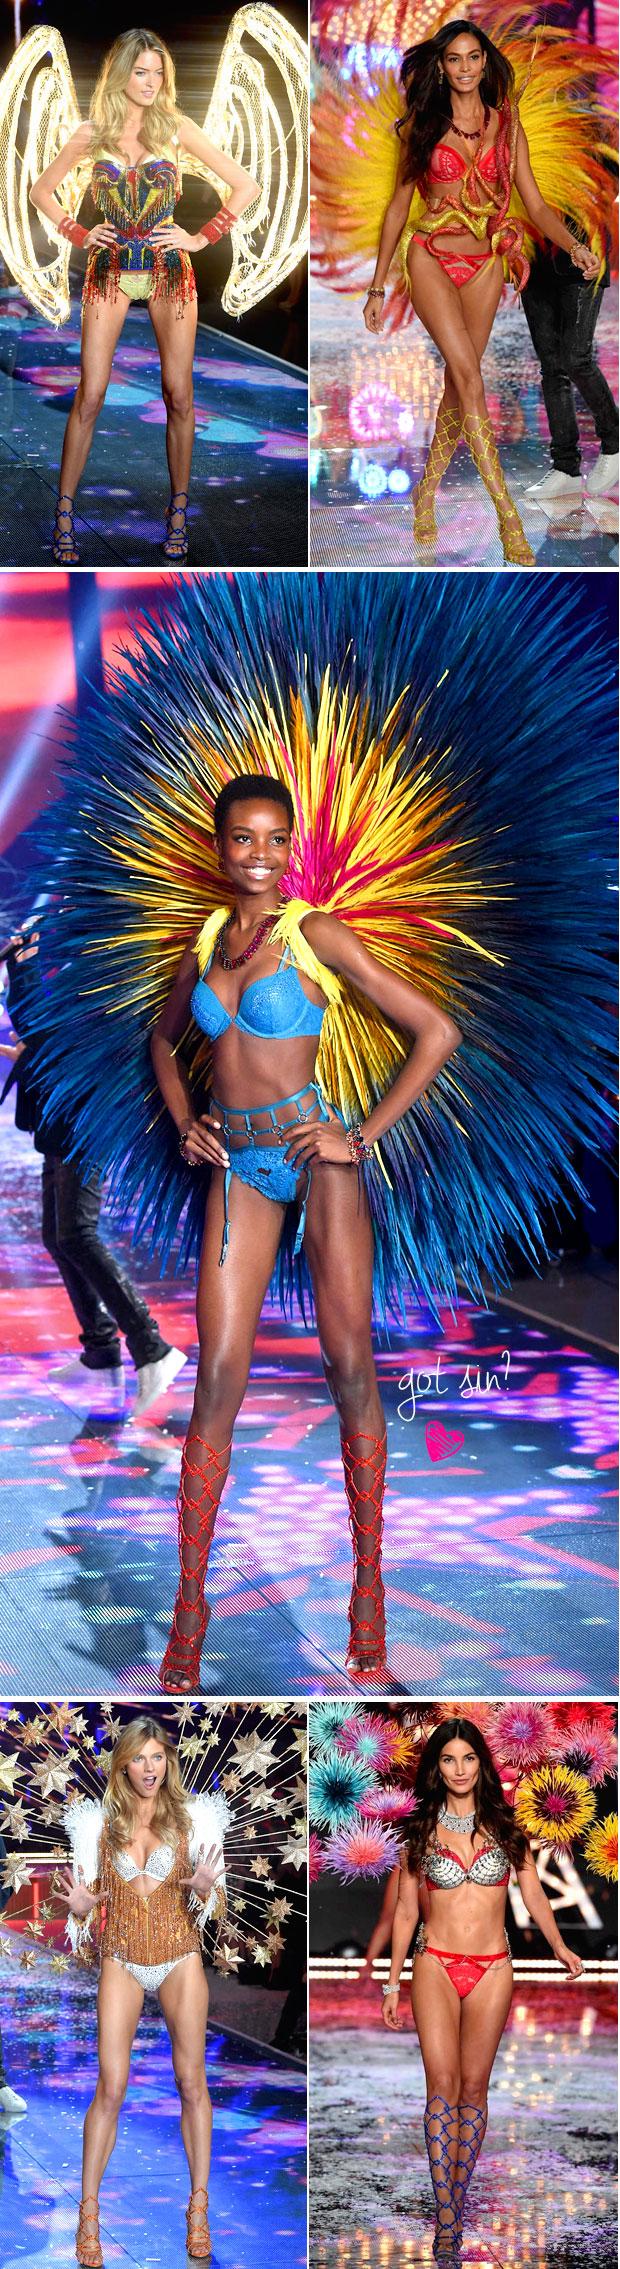 victorias-secret-fashion-show-todas-as-fotos-blog-got-sin-fireworks-maria-borges-lily-aldridge-fantasy-bra